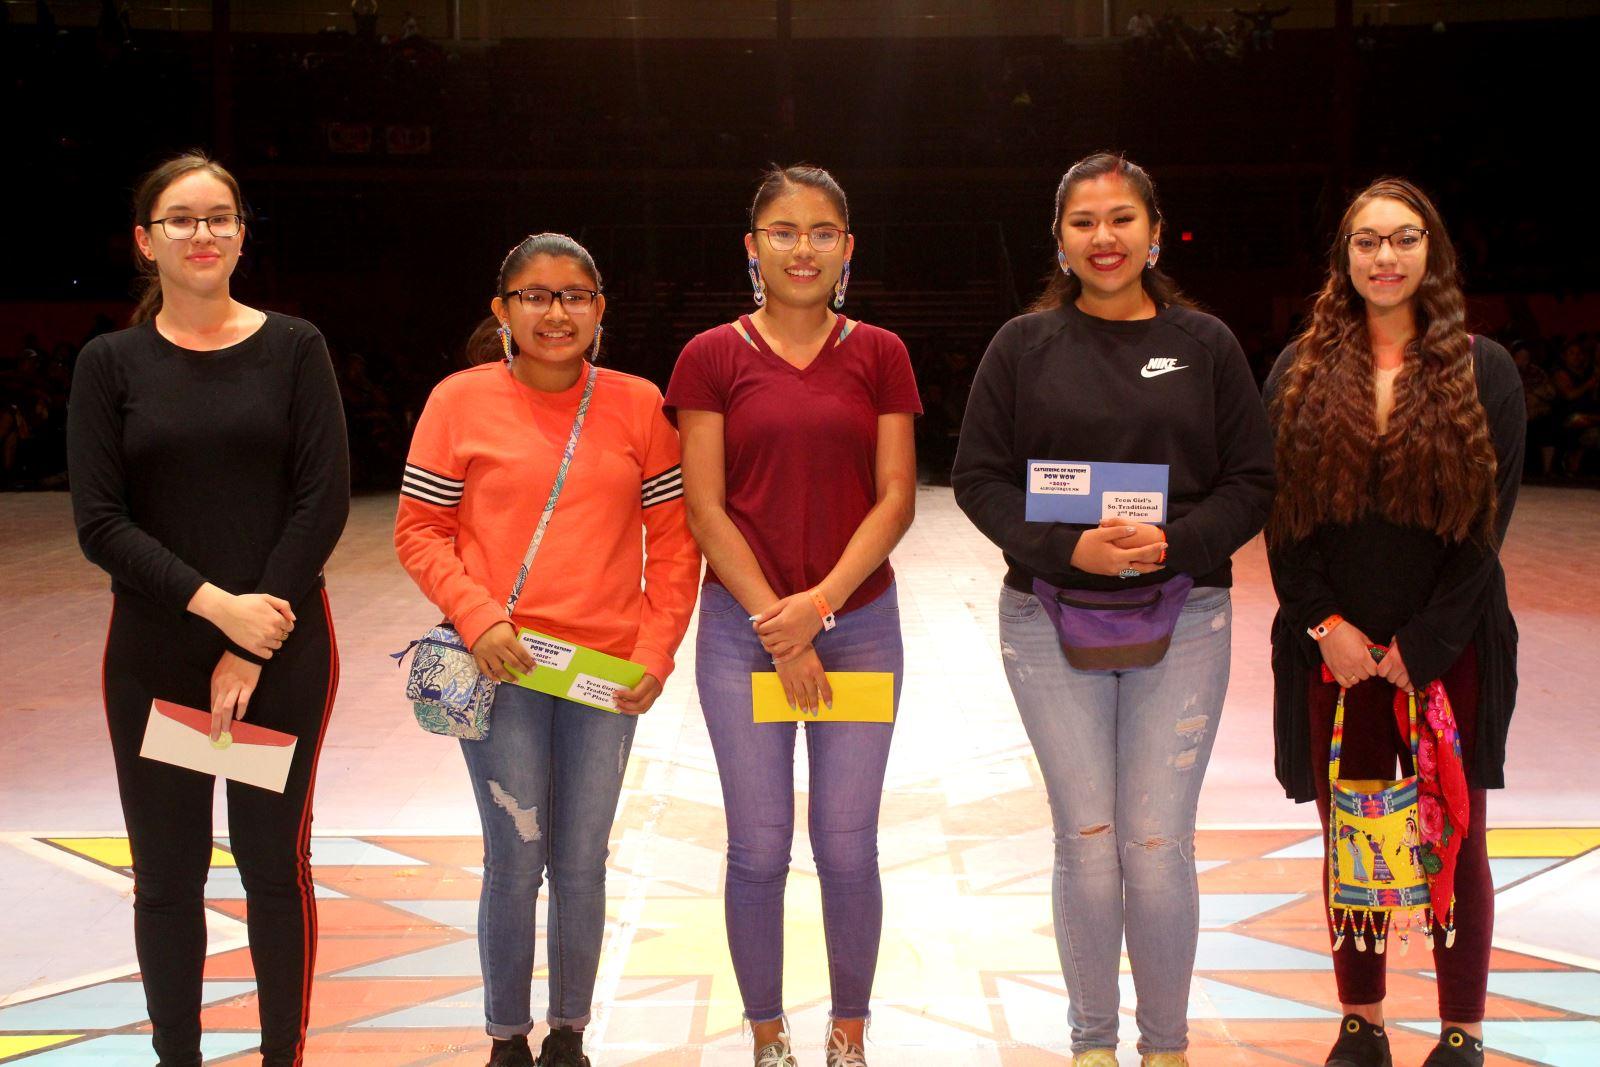 Teen Girls Southern Traditional Winners